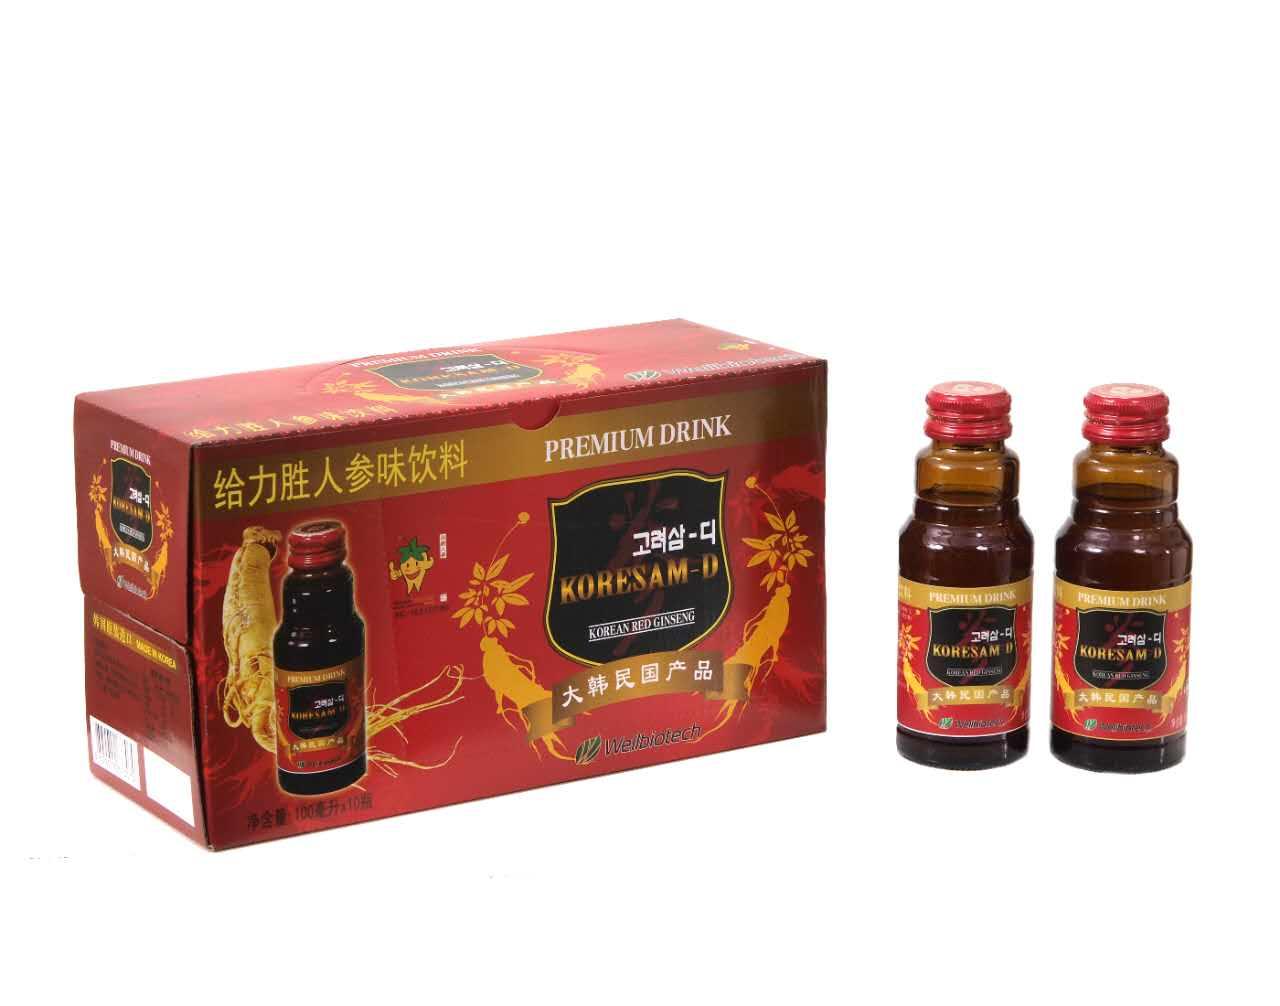 Wellbiotech/KORESAM-D  PREMIUM DRINK